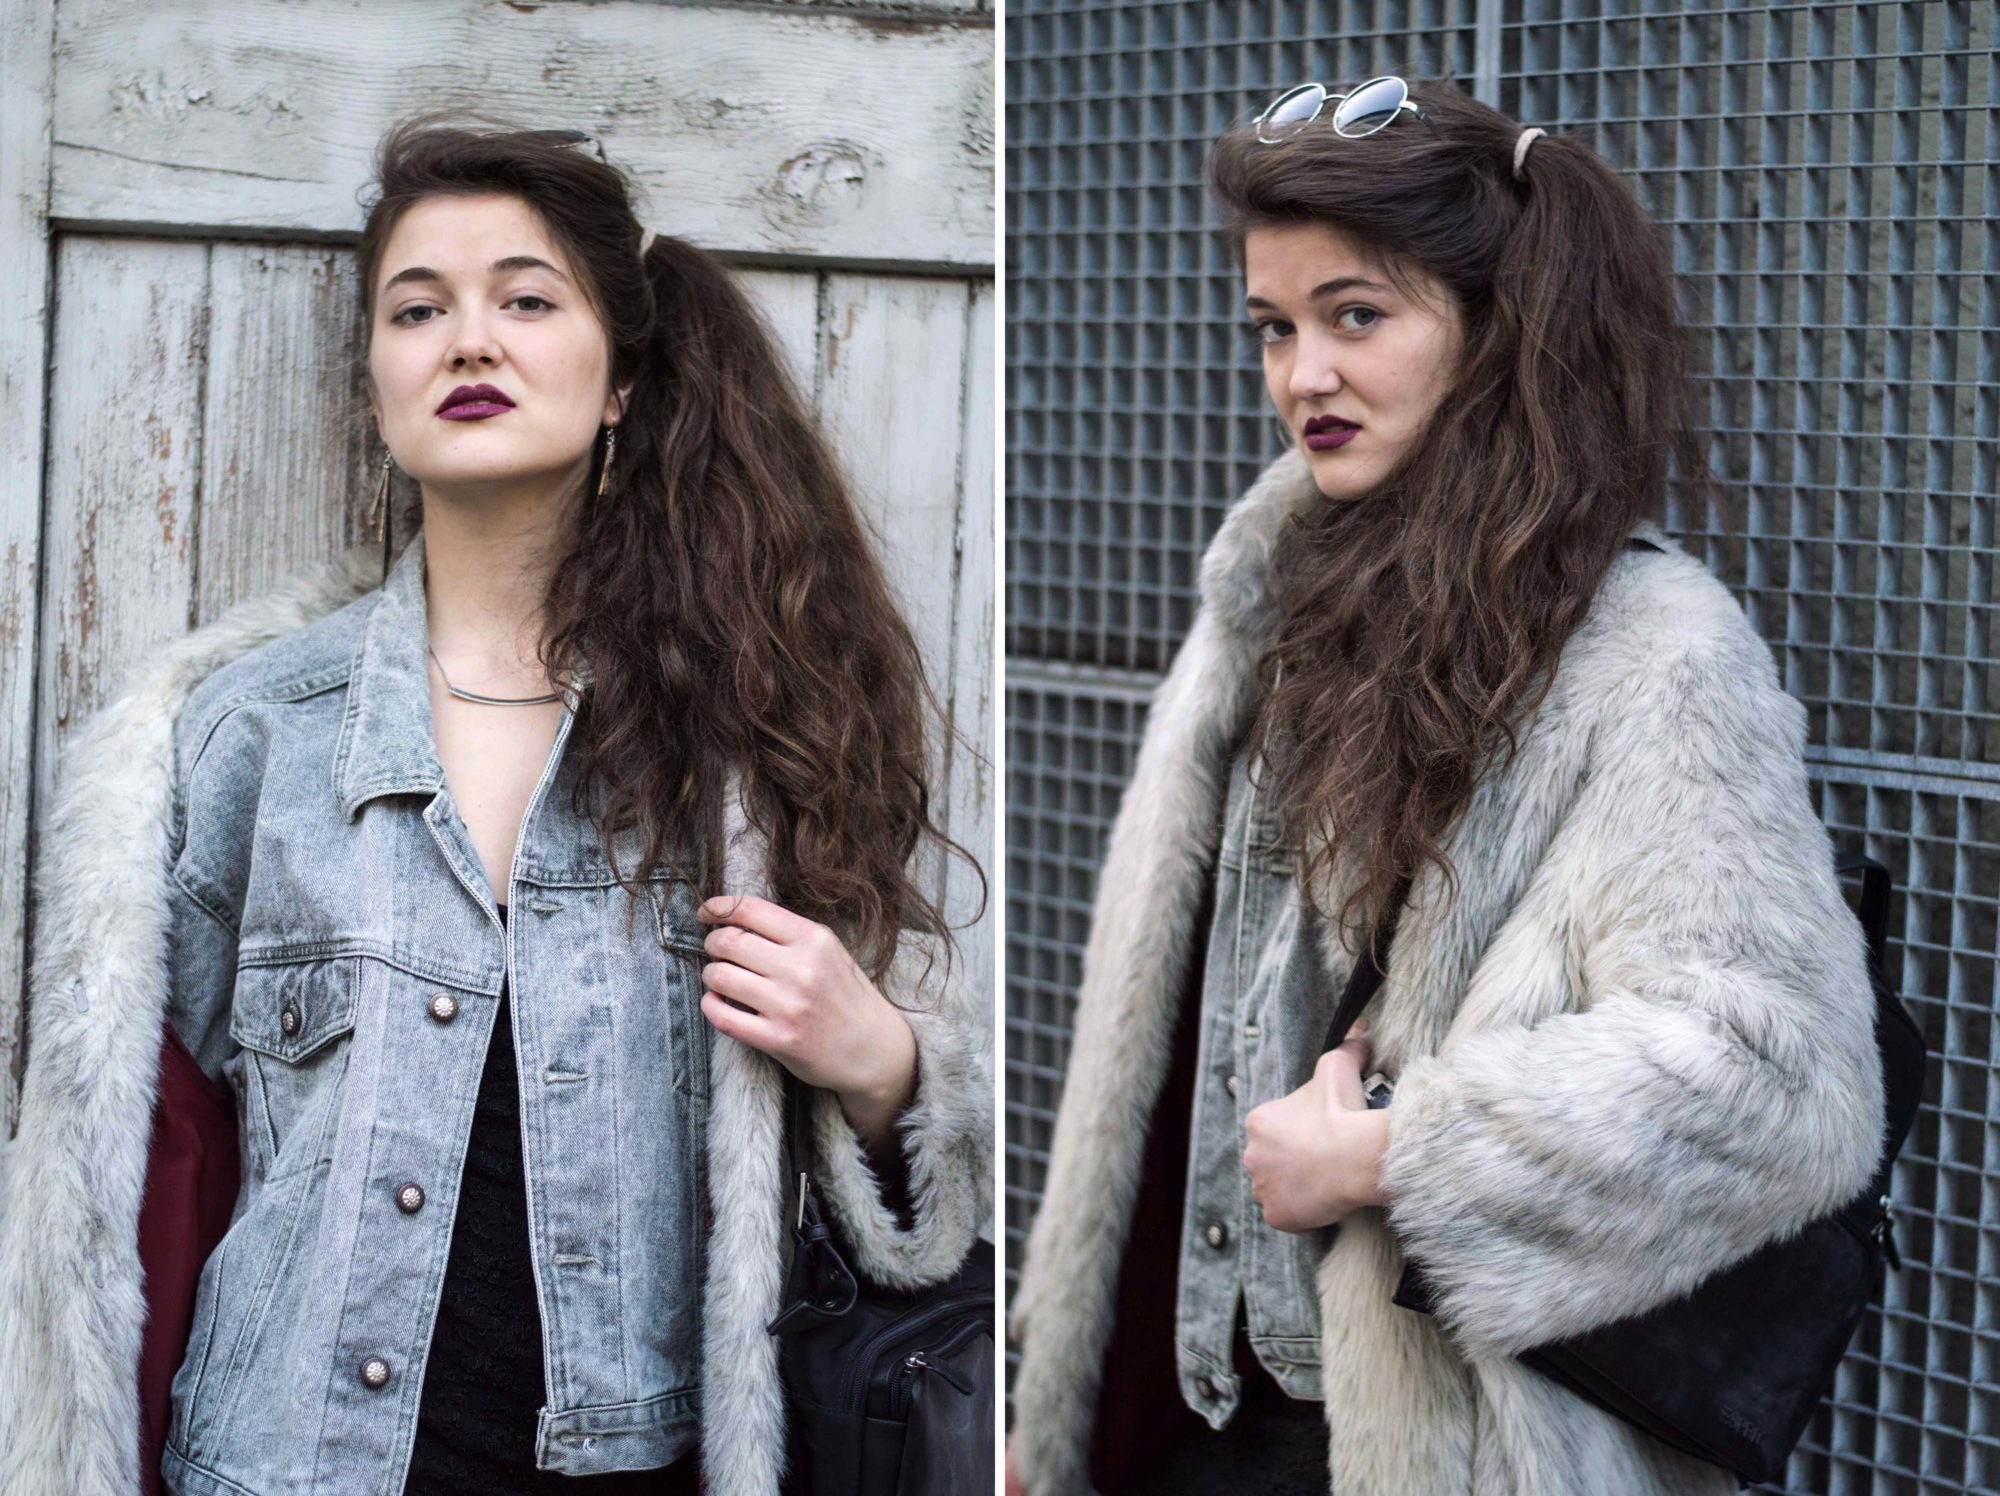 Faux Fur Pelz Fake Pelzmantel Gegenargumente Vintage Second Hand Grunge Outfit Soft Grunge Graz Österreich Europa